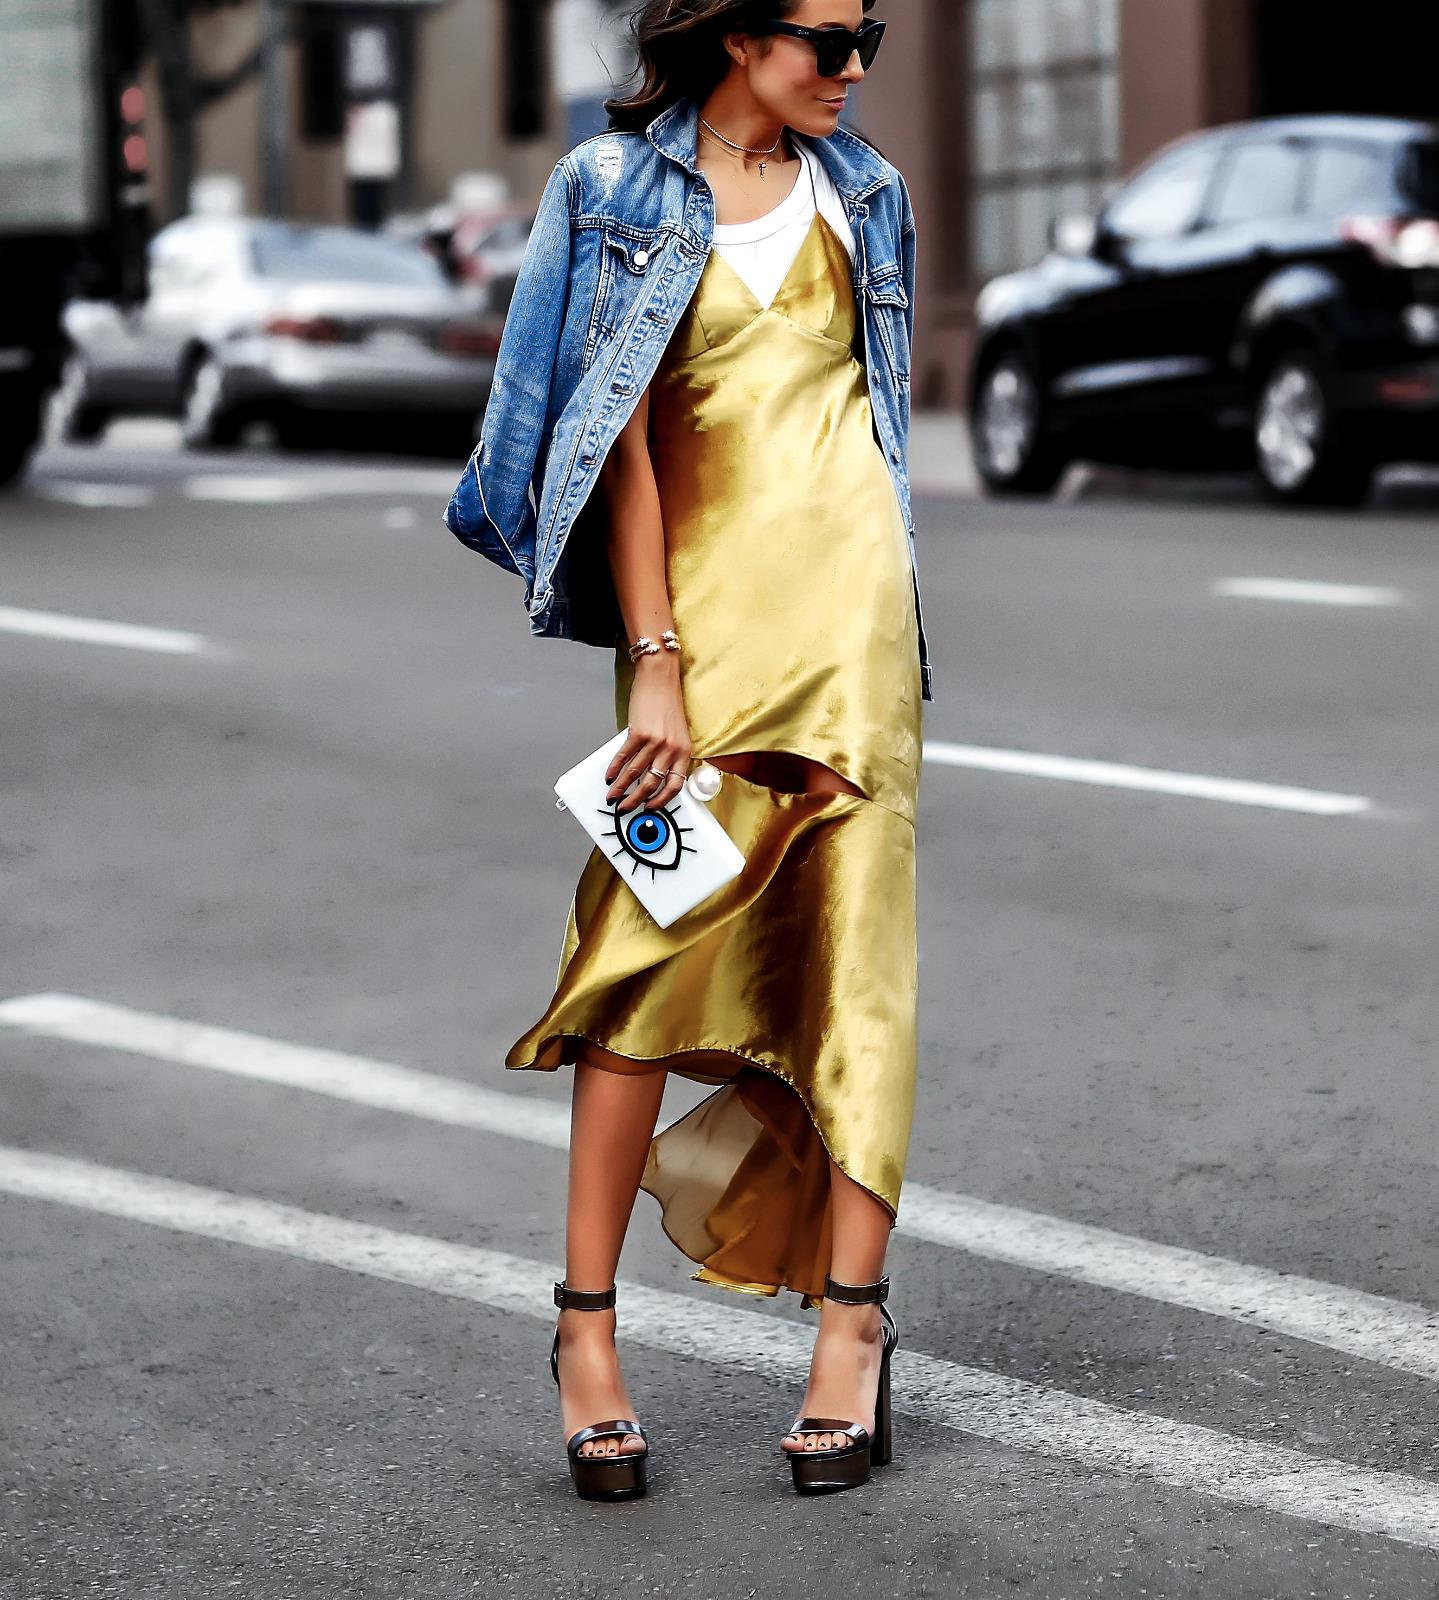 Casual NYE Look MILLY Velvet Dress Jean Jacket and Platforms.jpg